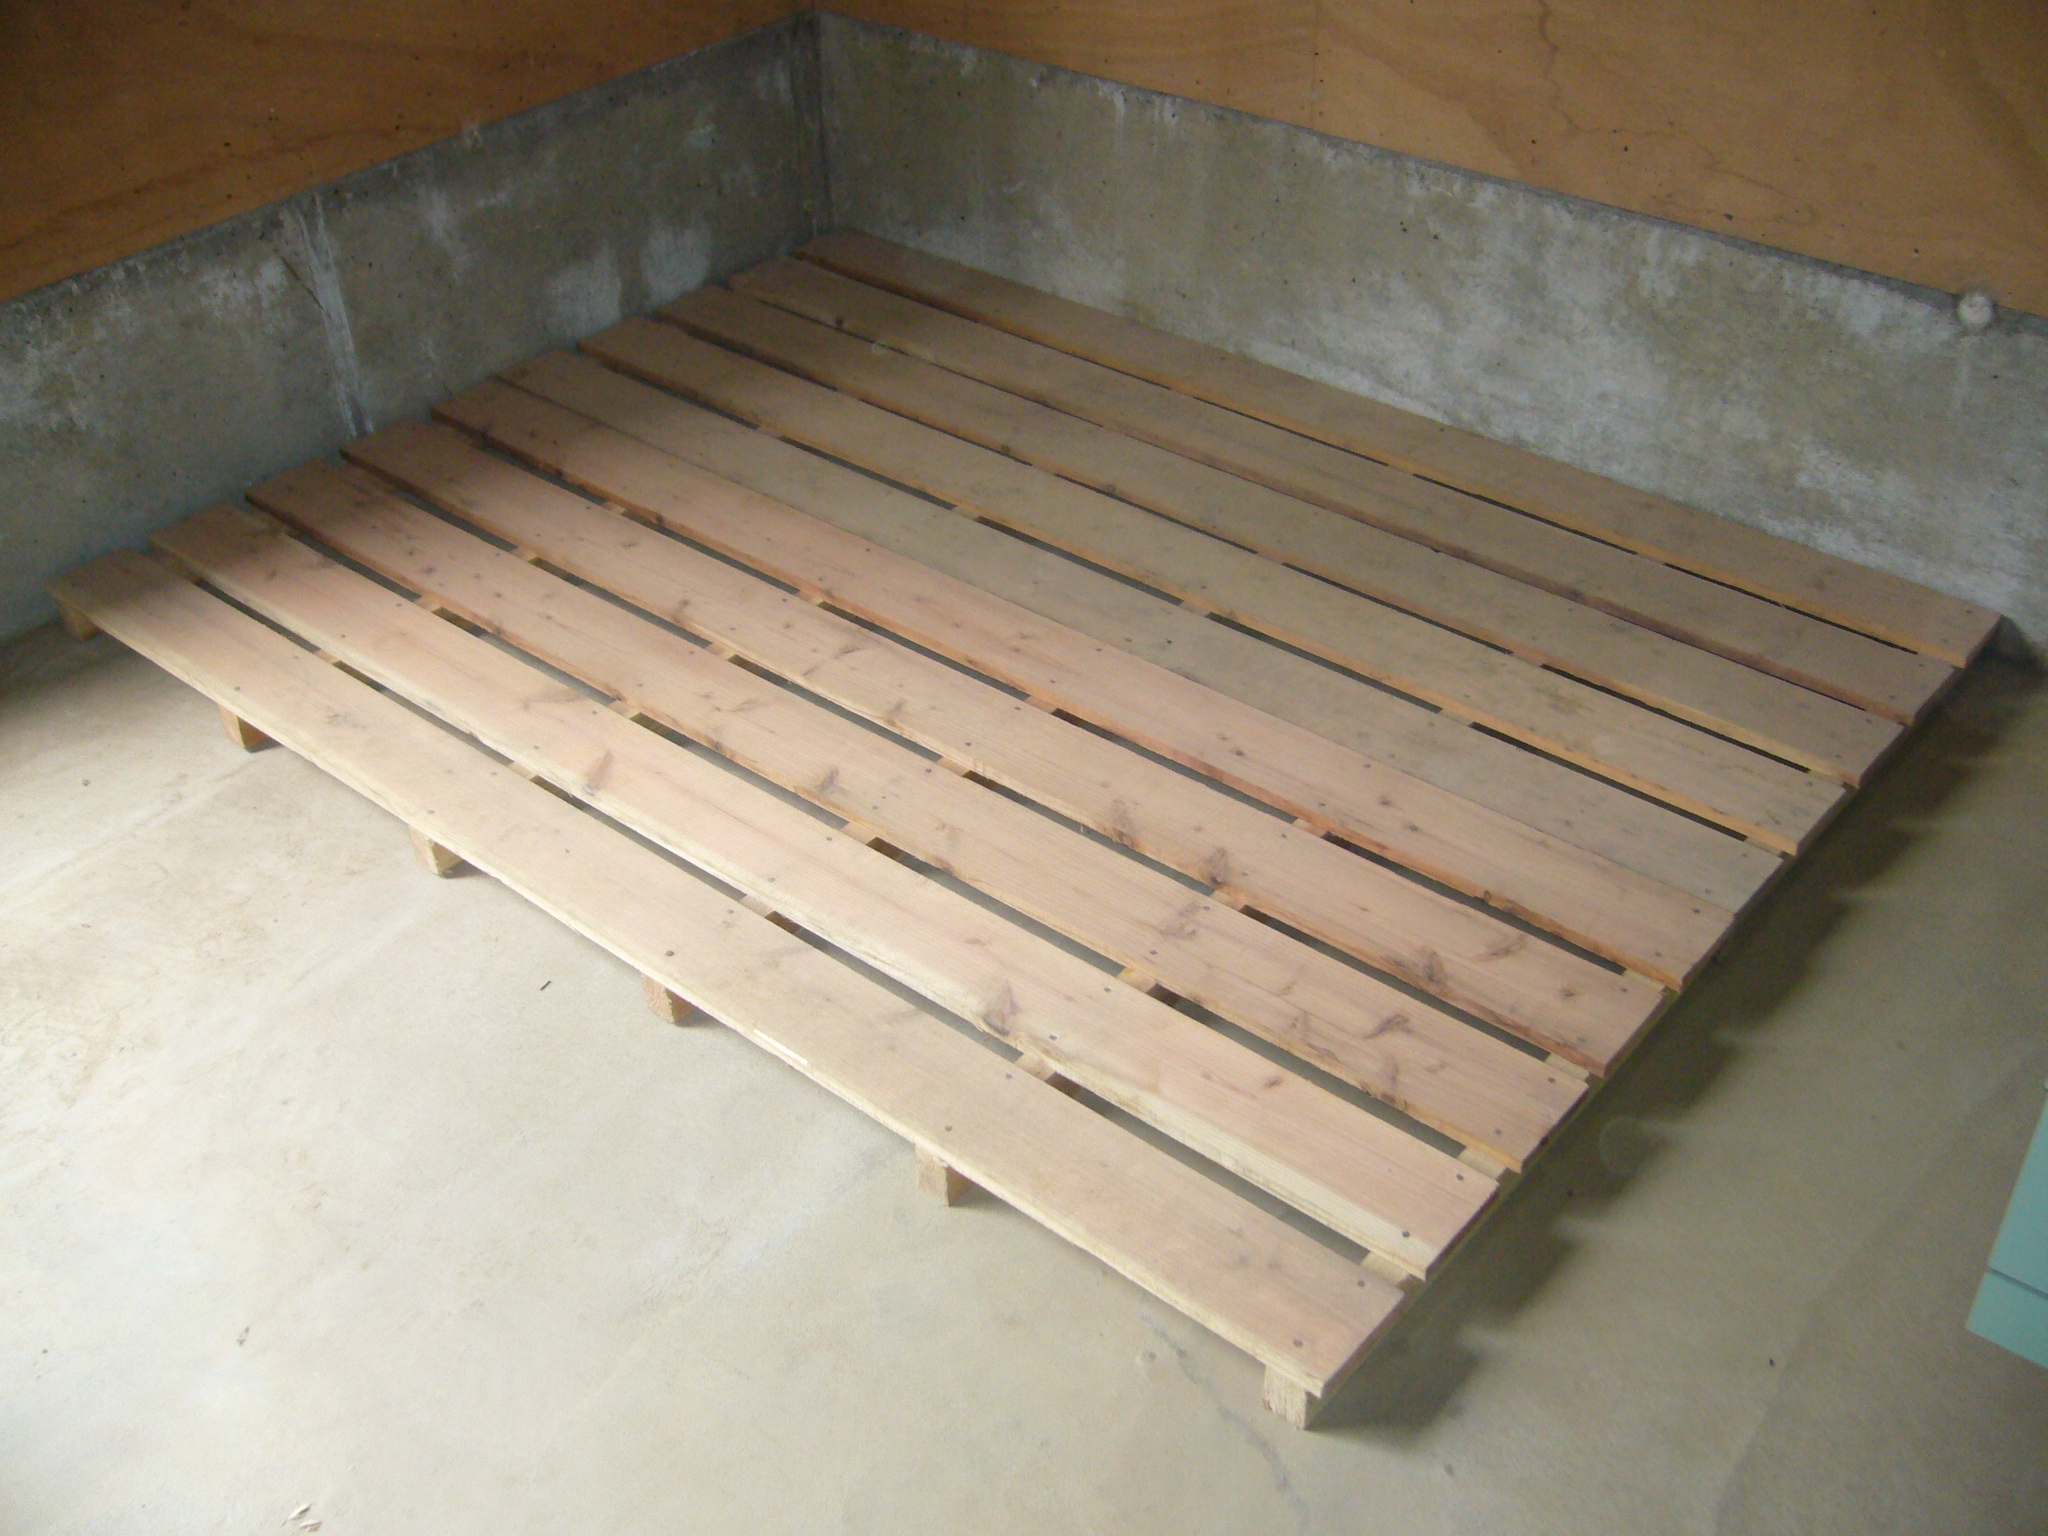 Duckboards wiki everipedia for Hardwood flooring wiki